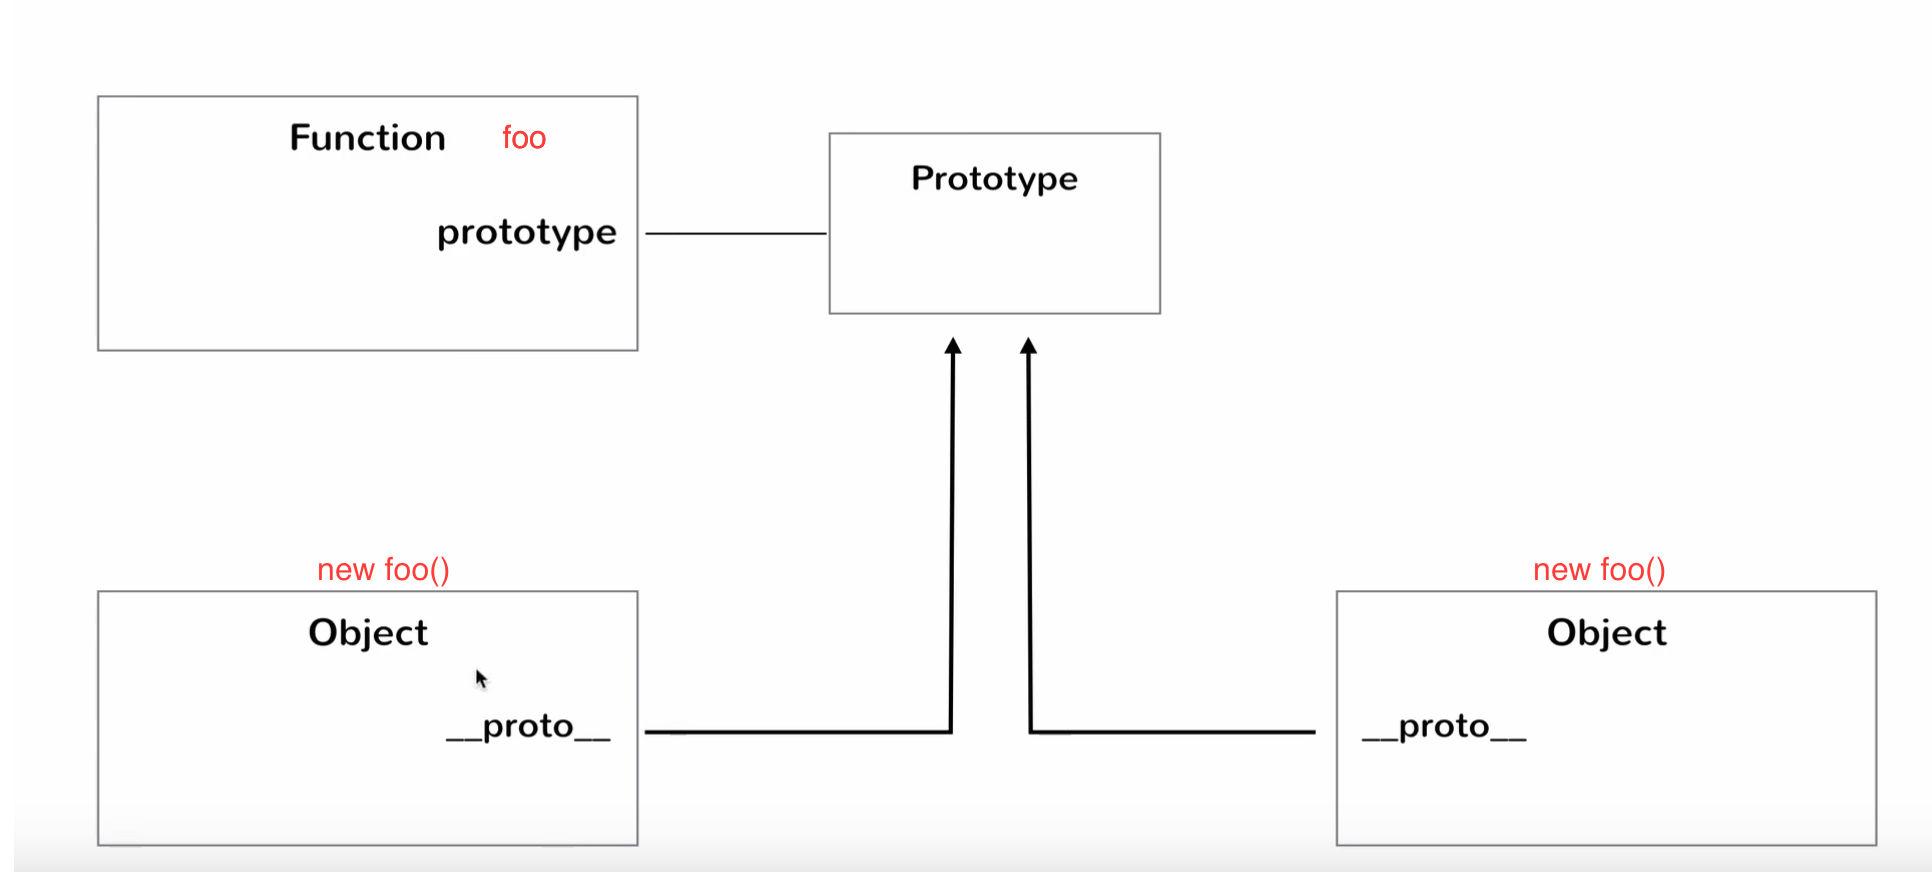 The __proto__ property